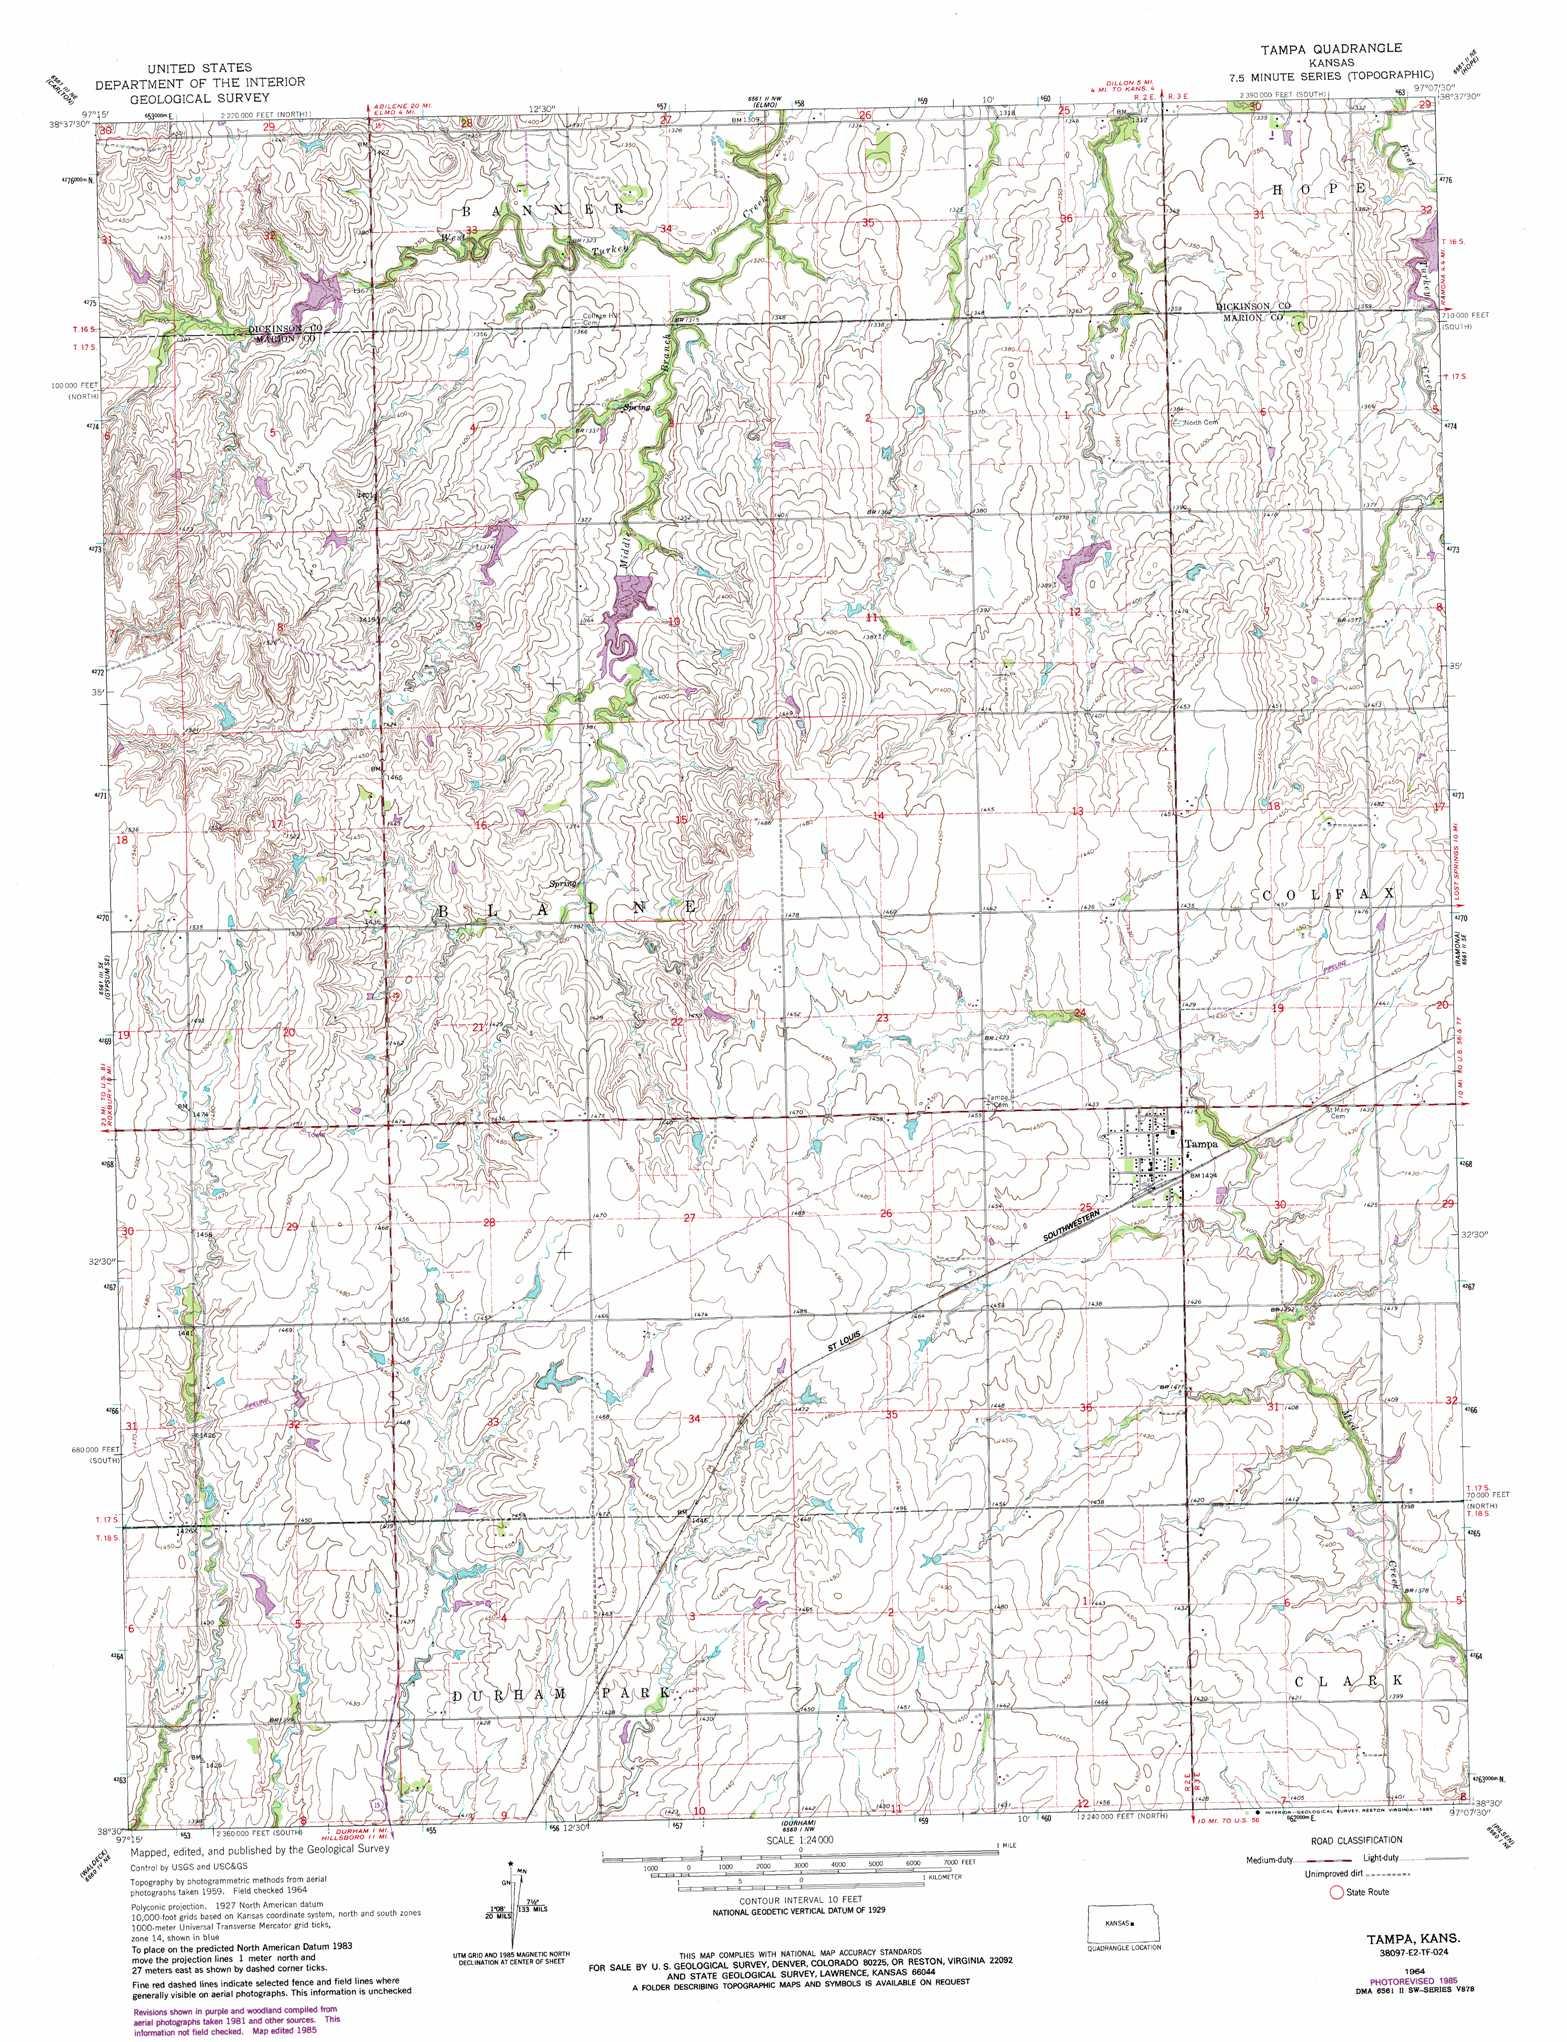 Tampa Topographic Map.Tampa Topographic Map Ks Usgs Topo Quad 38097e2